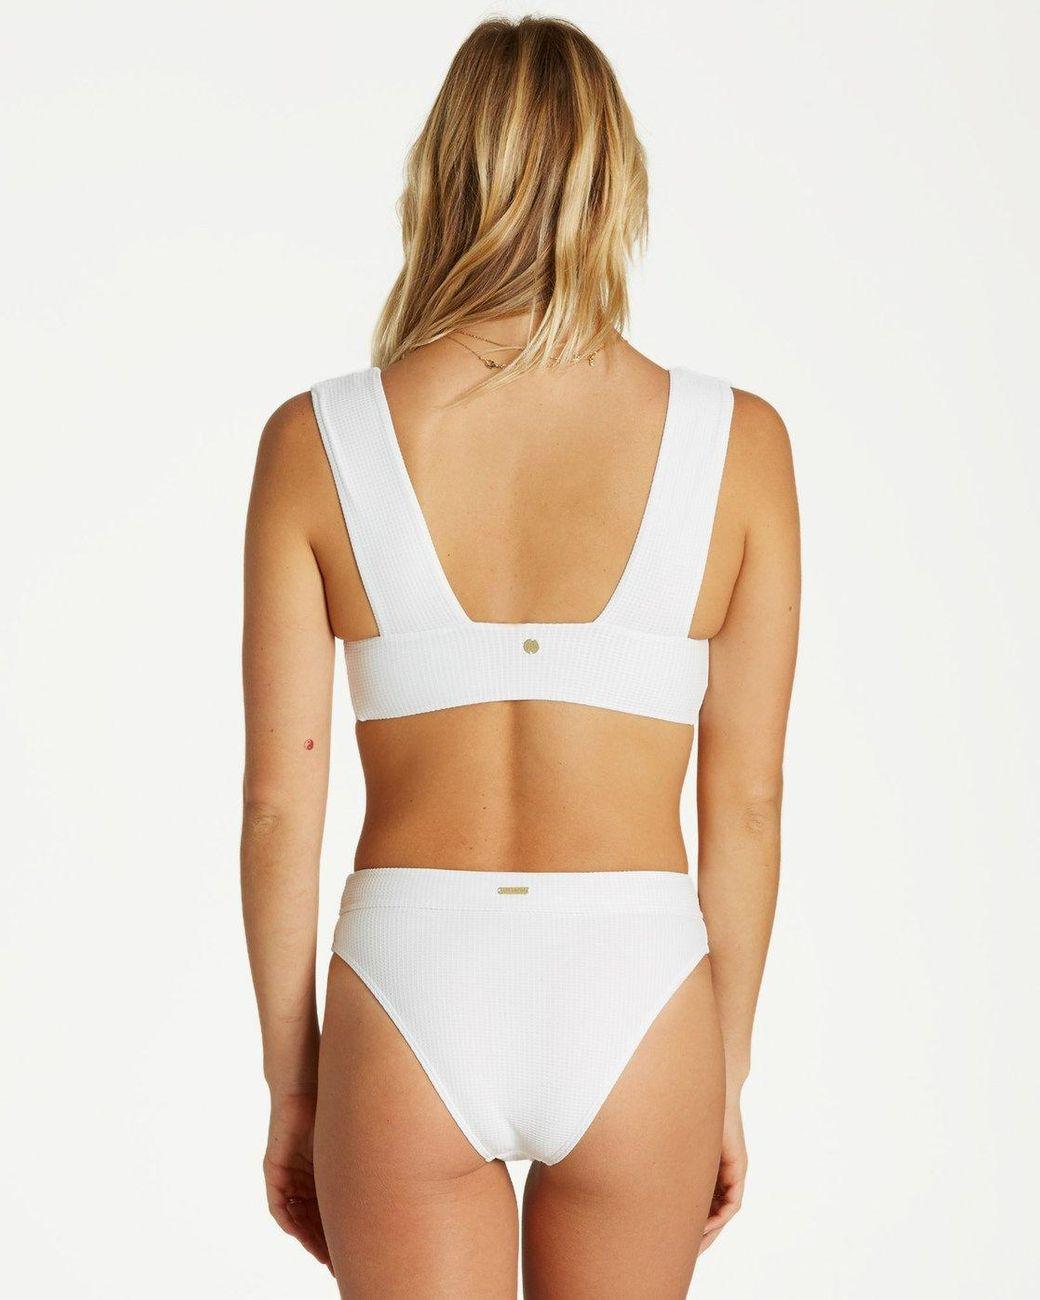 South Point Multi Color Print Ruffle Bodice Line Tankini Top Swimwear MSRP $44